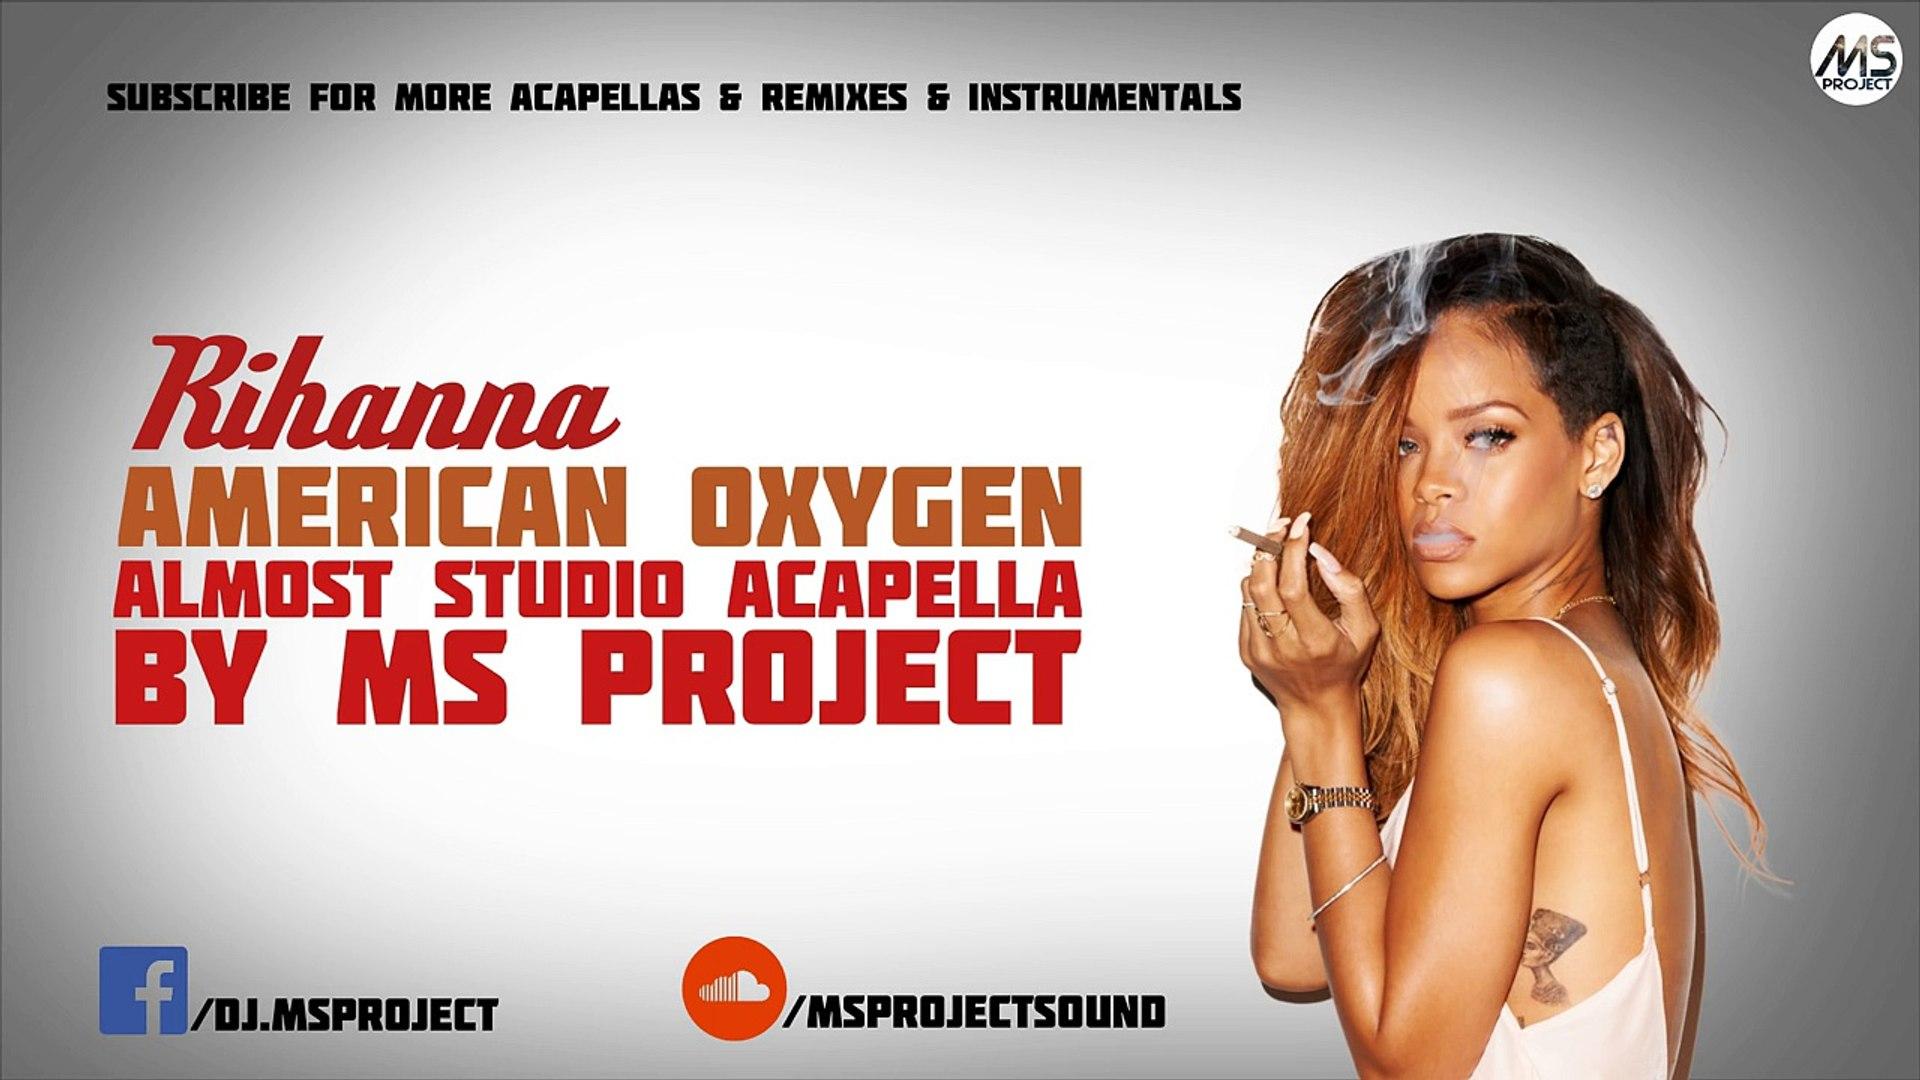 Rihanna - American Oxygen (Acapella - Vocals Only) + DL